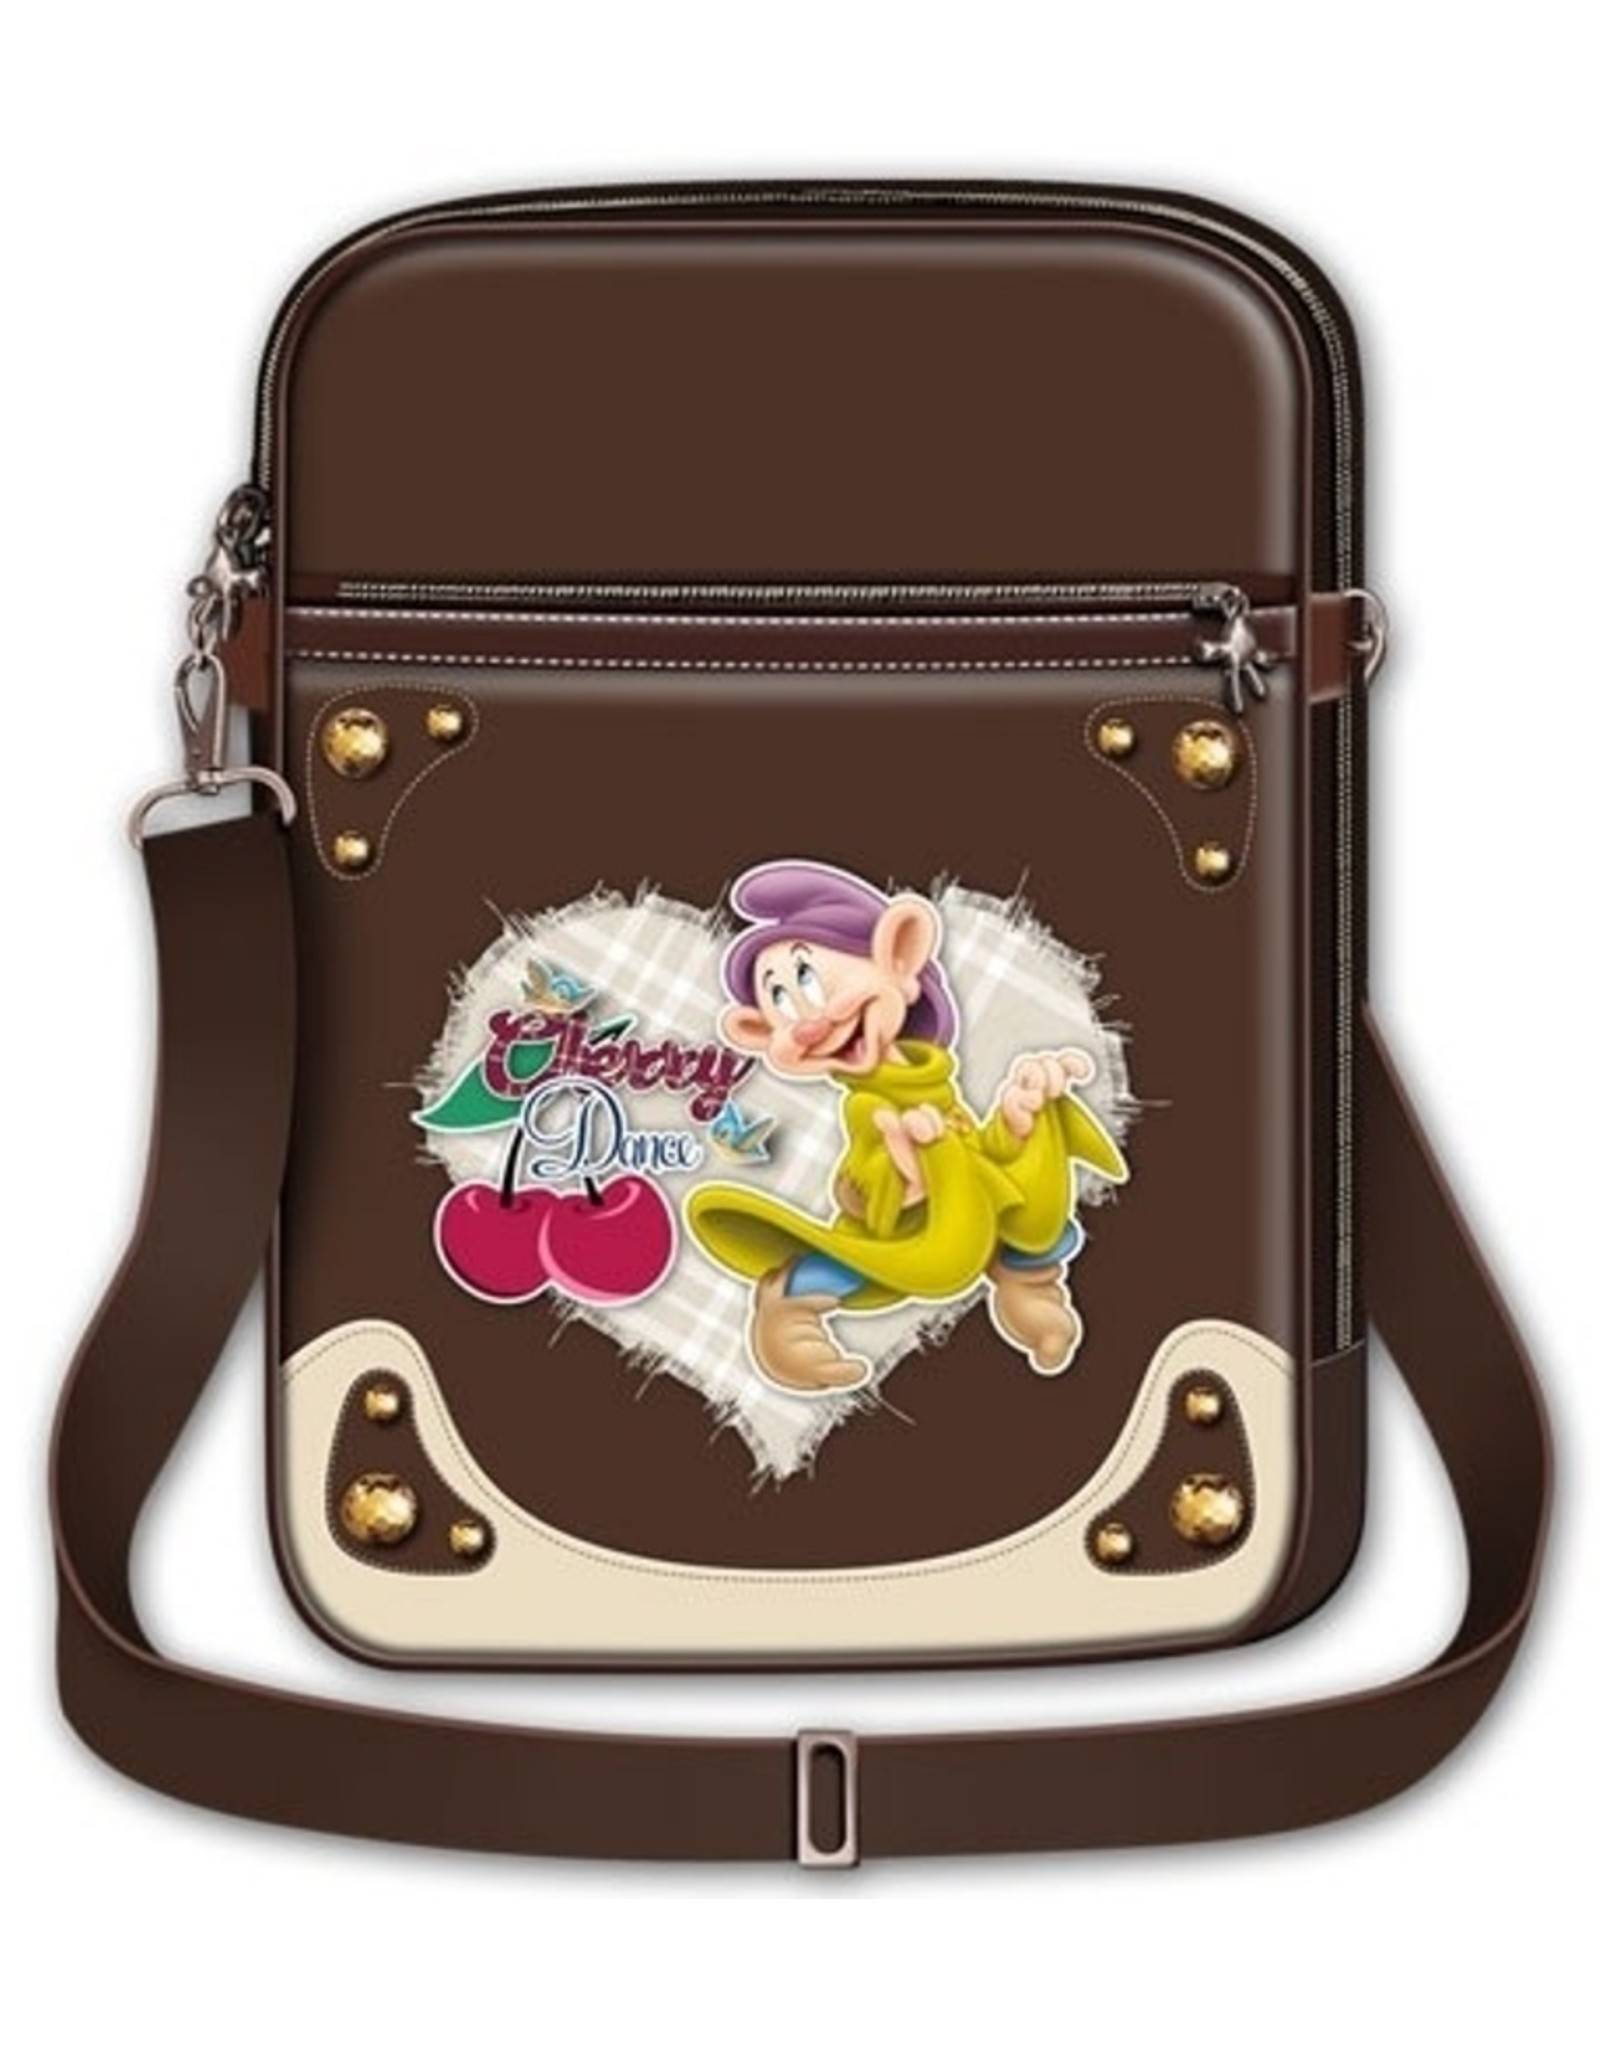 Disney Disney bags - Dopey Cherry Dance Disney Tablet bag